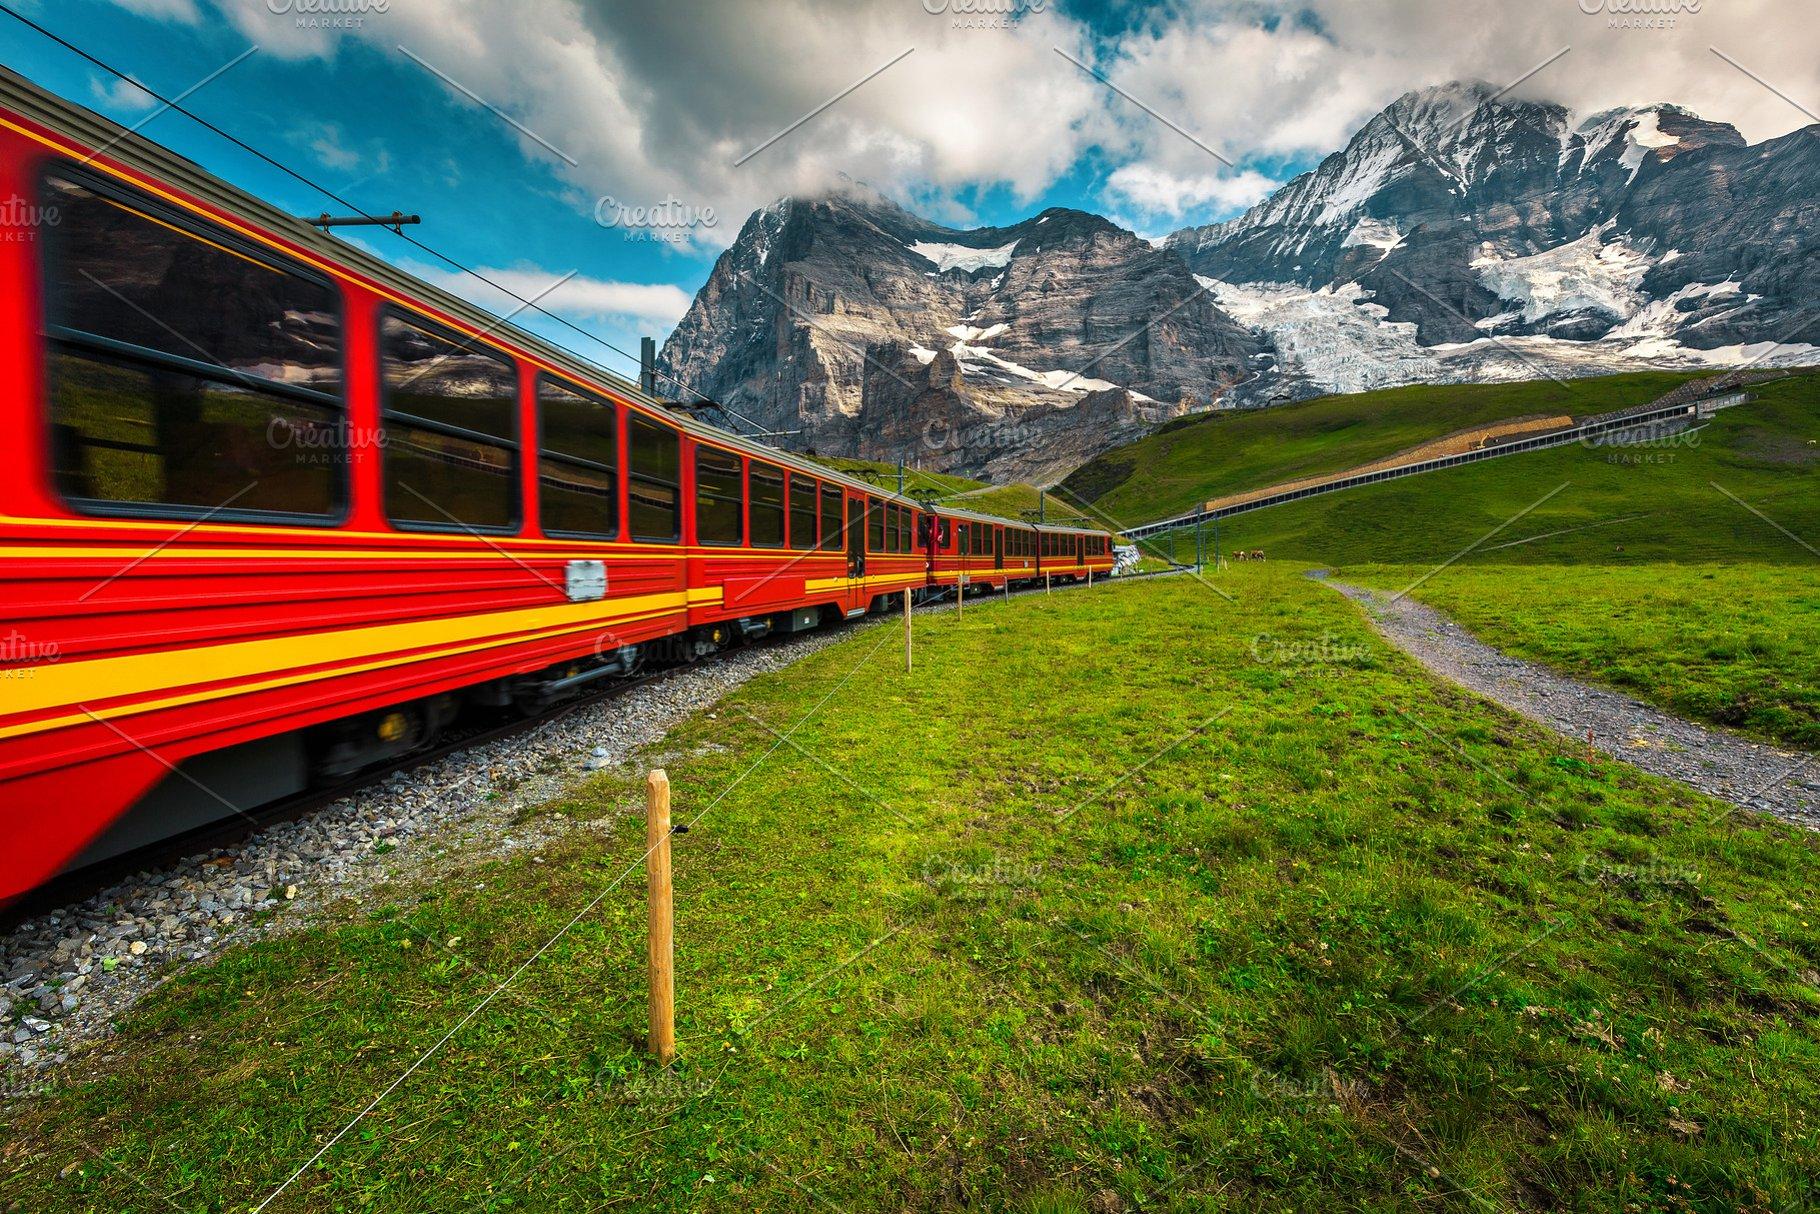 Red cogwheel tourist train